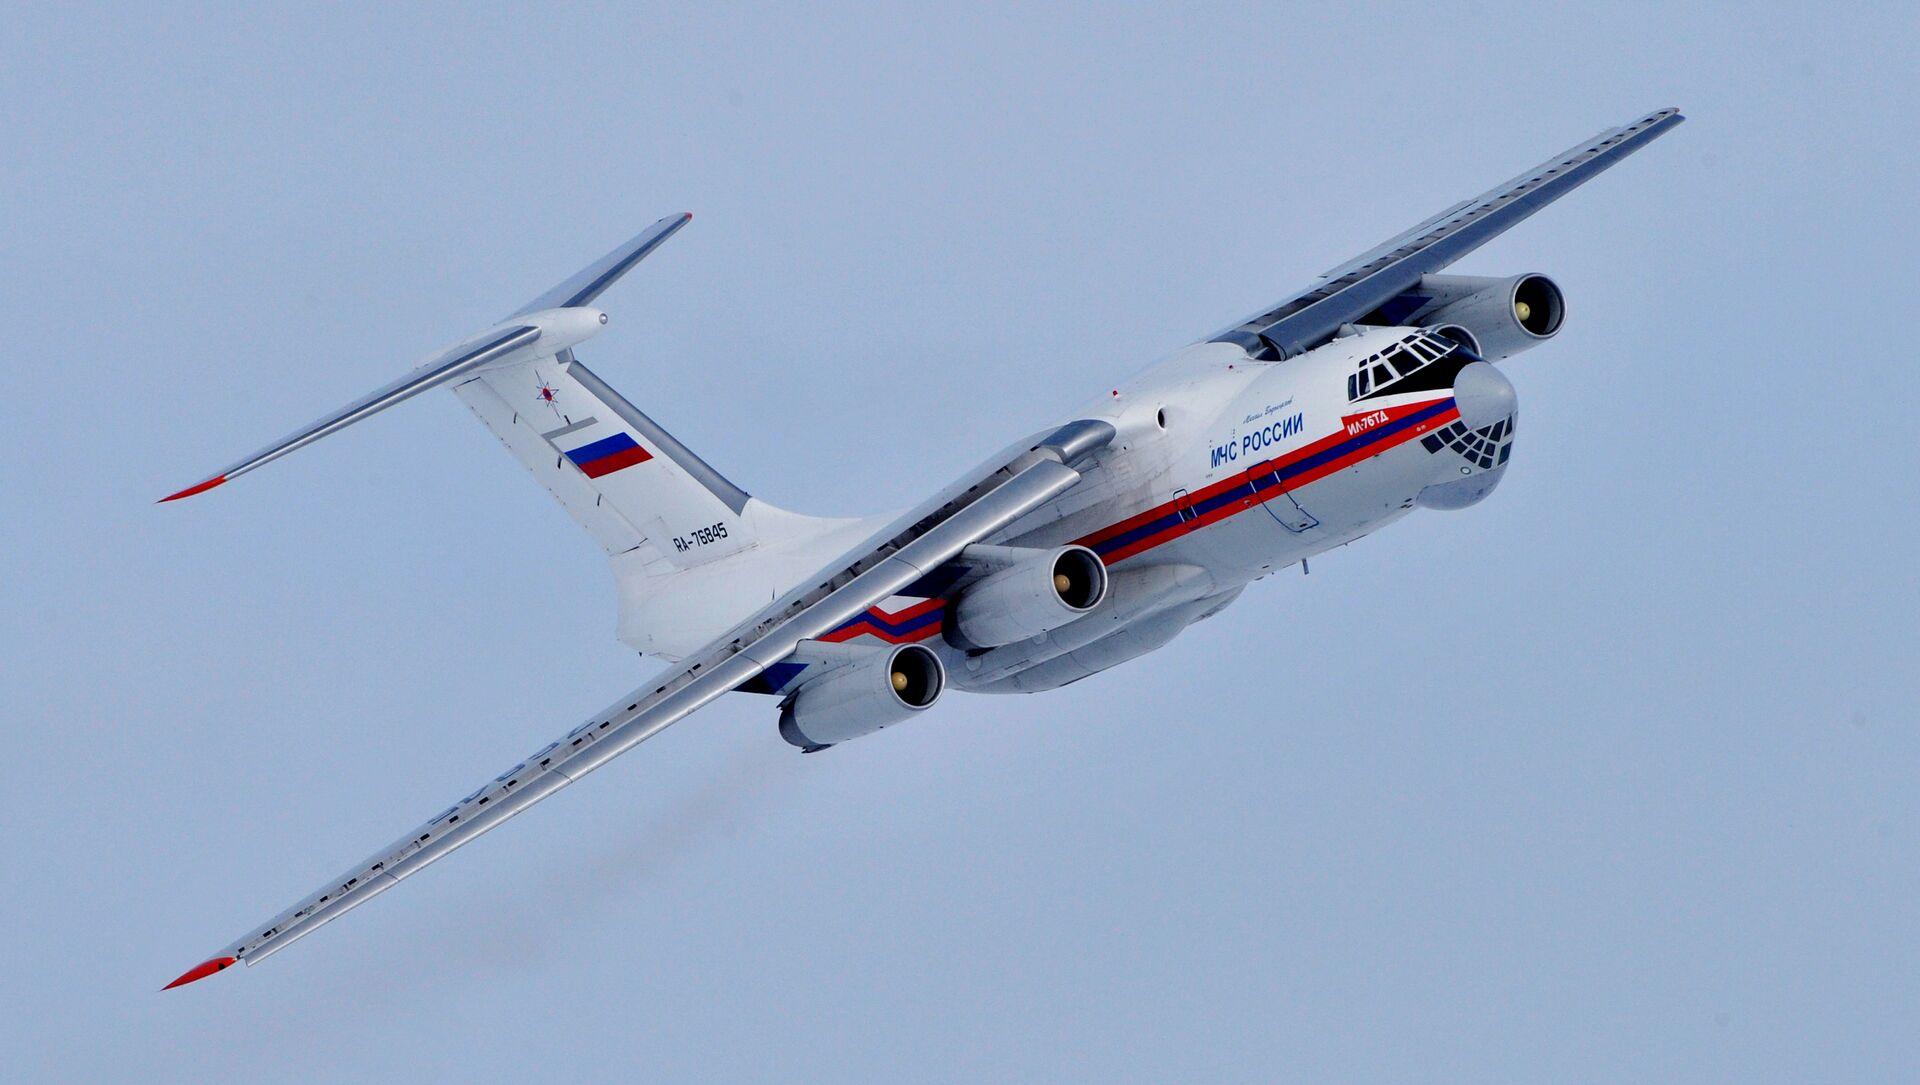 Avión Il-76 - Sputnik Mundo, 1920, 04.02.2021